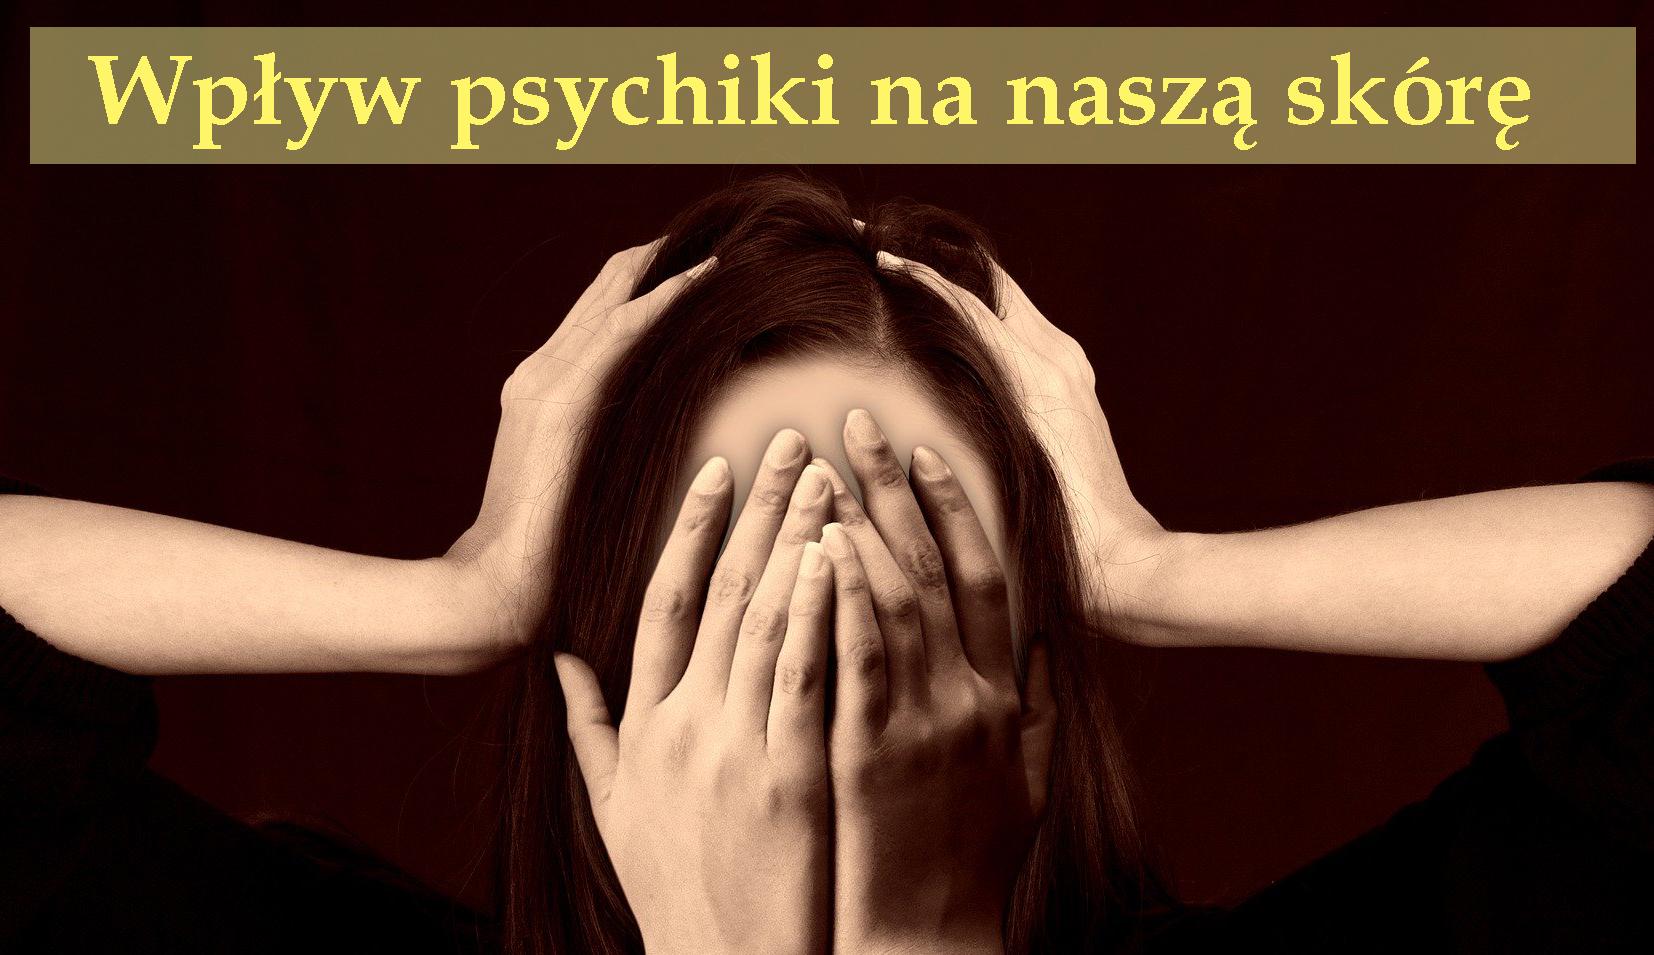 Stan psychiki na stan skóry